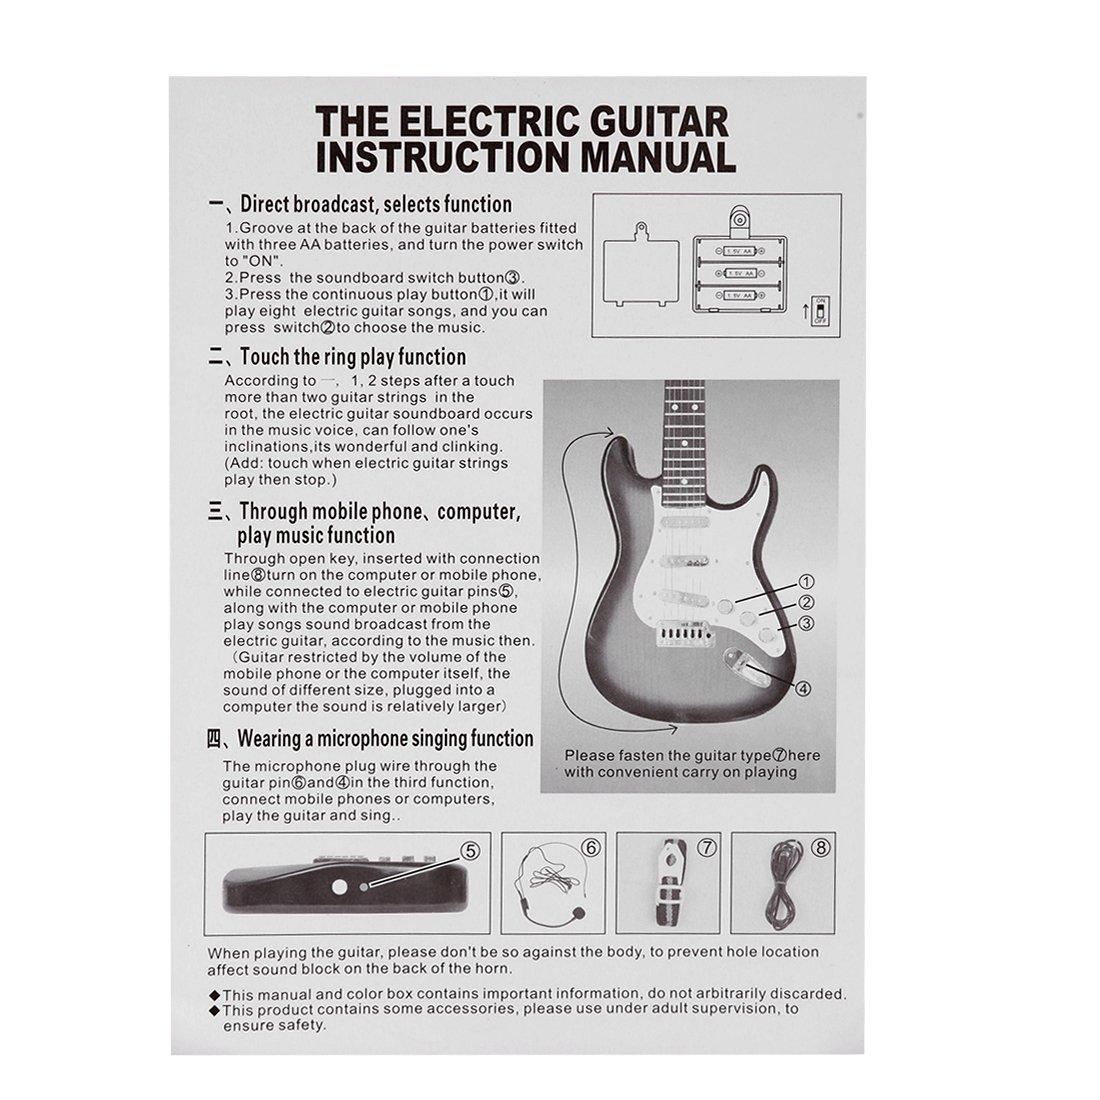 Tosbess Guitarra Electrica Juguete, Juguete de Guitarra Ukelele Musical para Niños, 4 Cuerdas Guitarra Clásica Juguete Eléctrico del Instrumento Música para ...